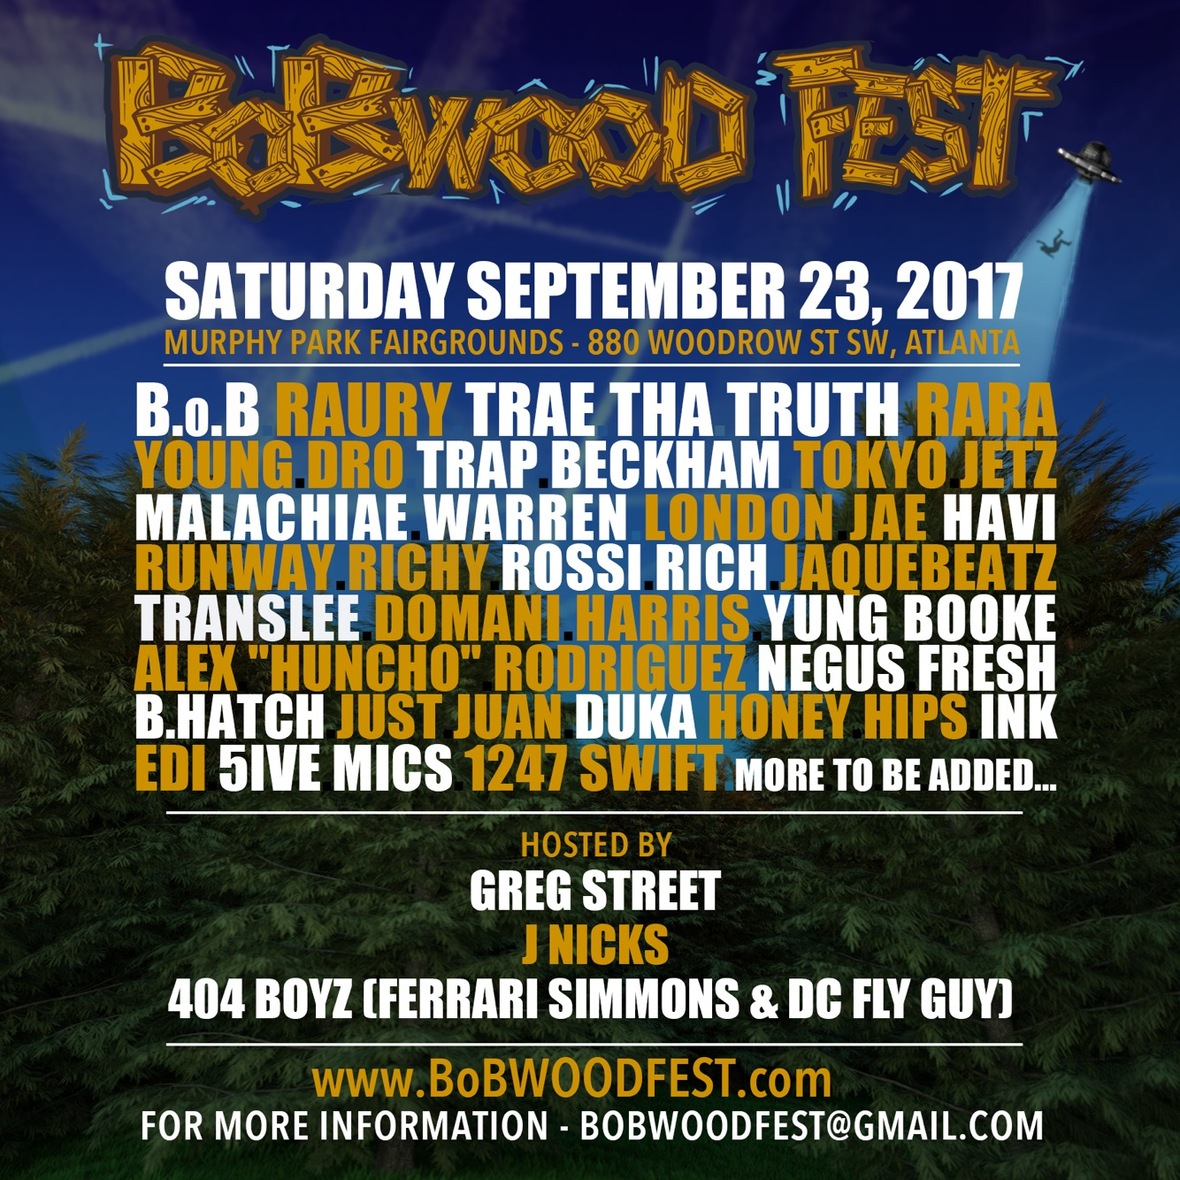 B.o.B Announces Third Annual BoBWOOD Fest In Atlanta September 23rd!